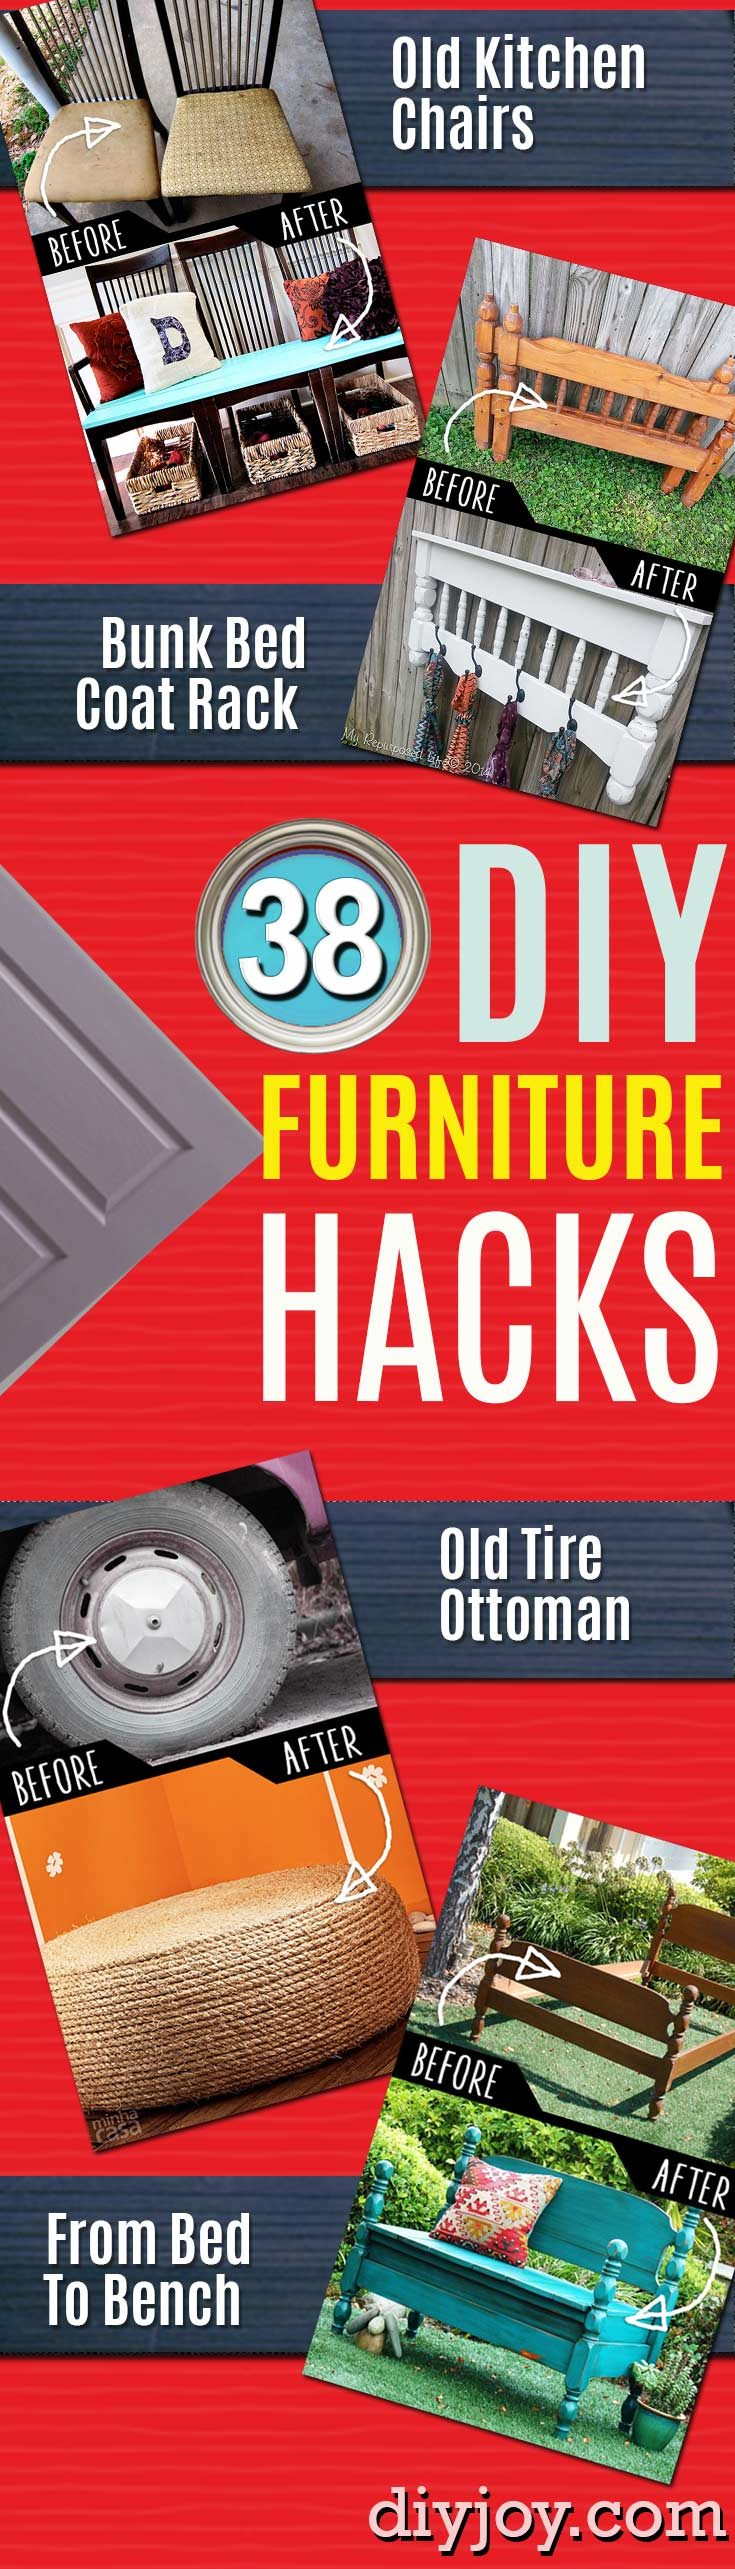 39 Creative DIY Furniture Ideas & Home Decor Hacks